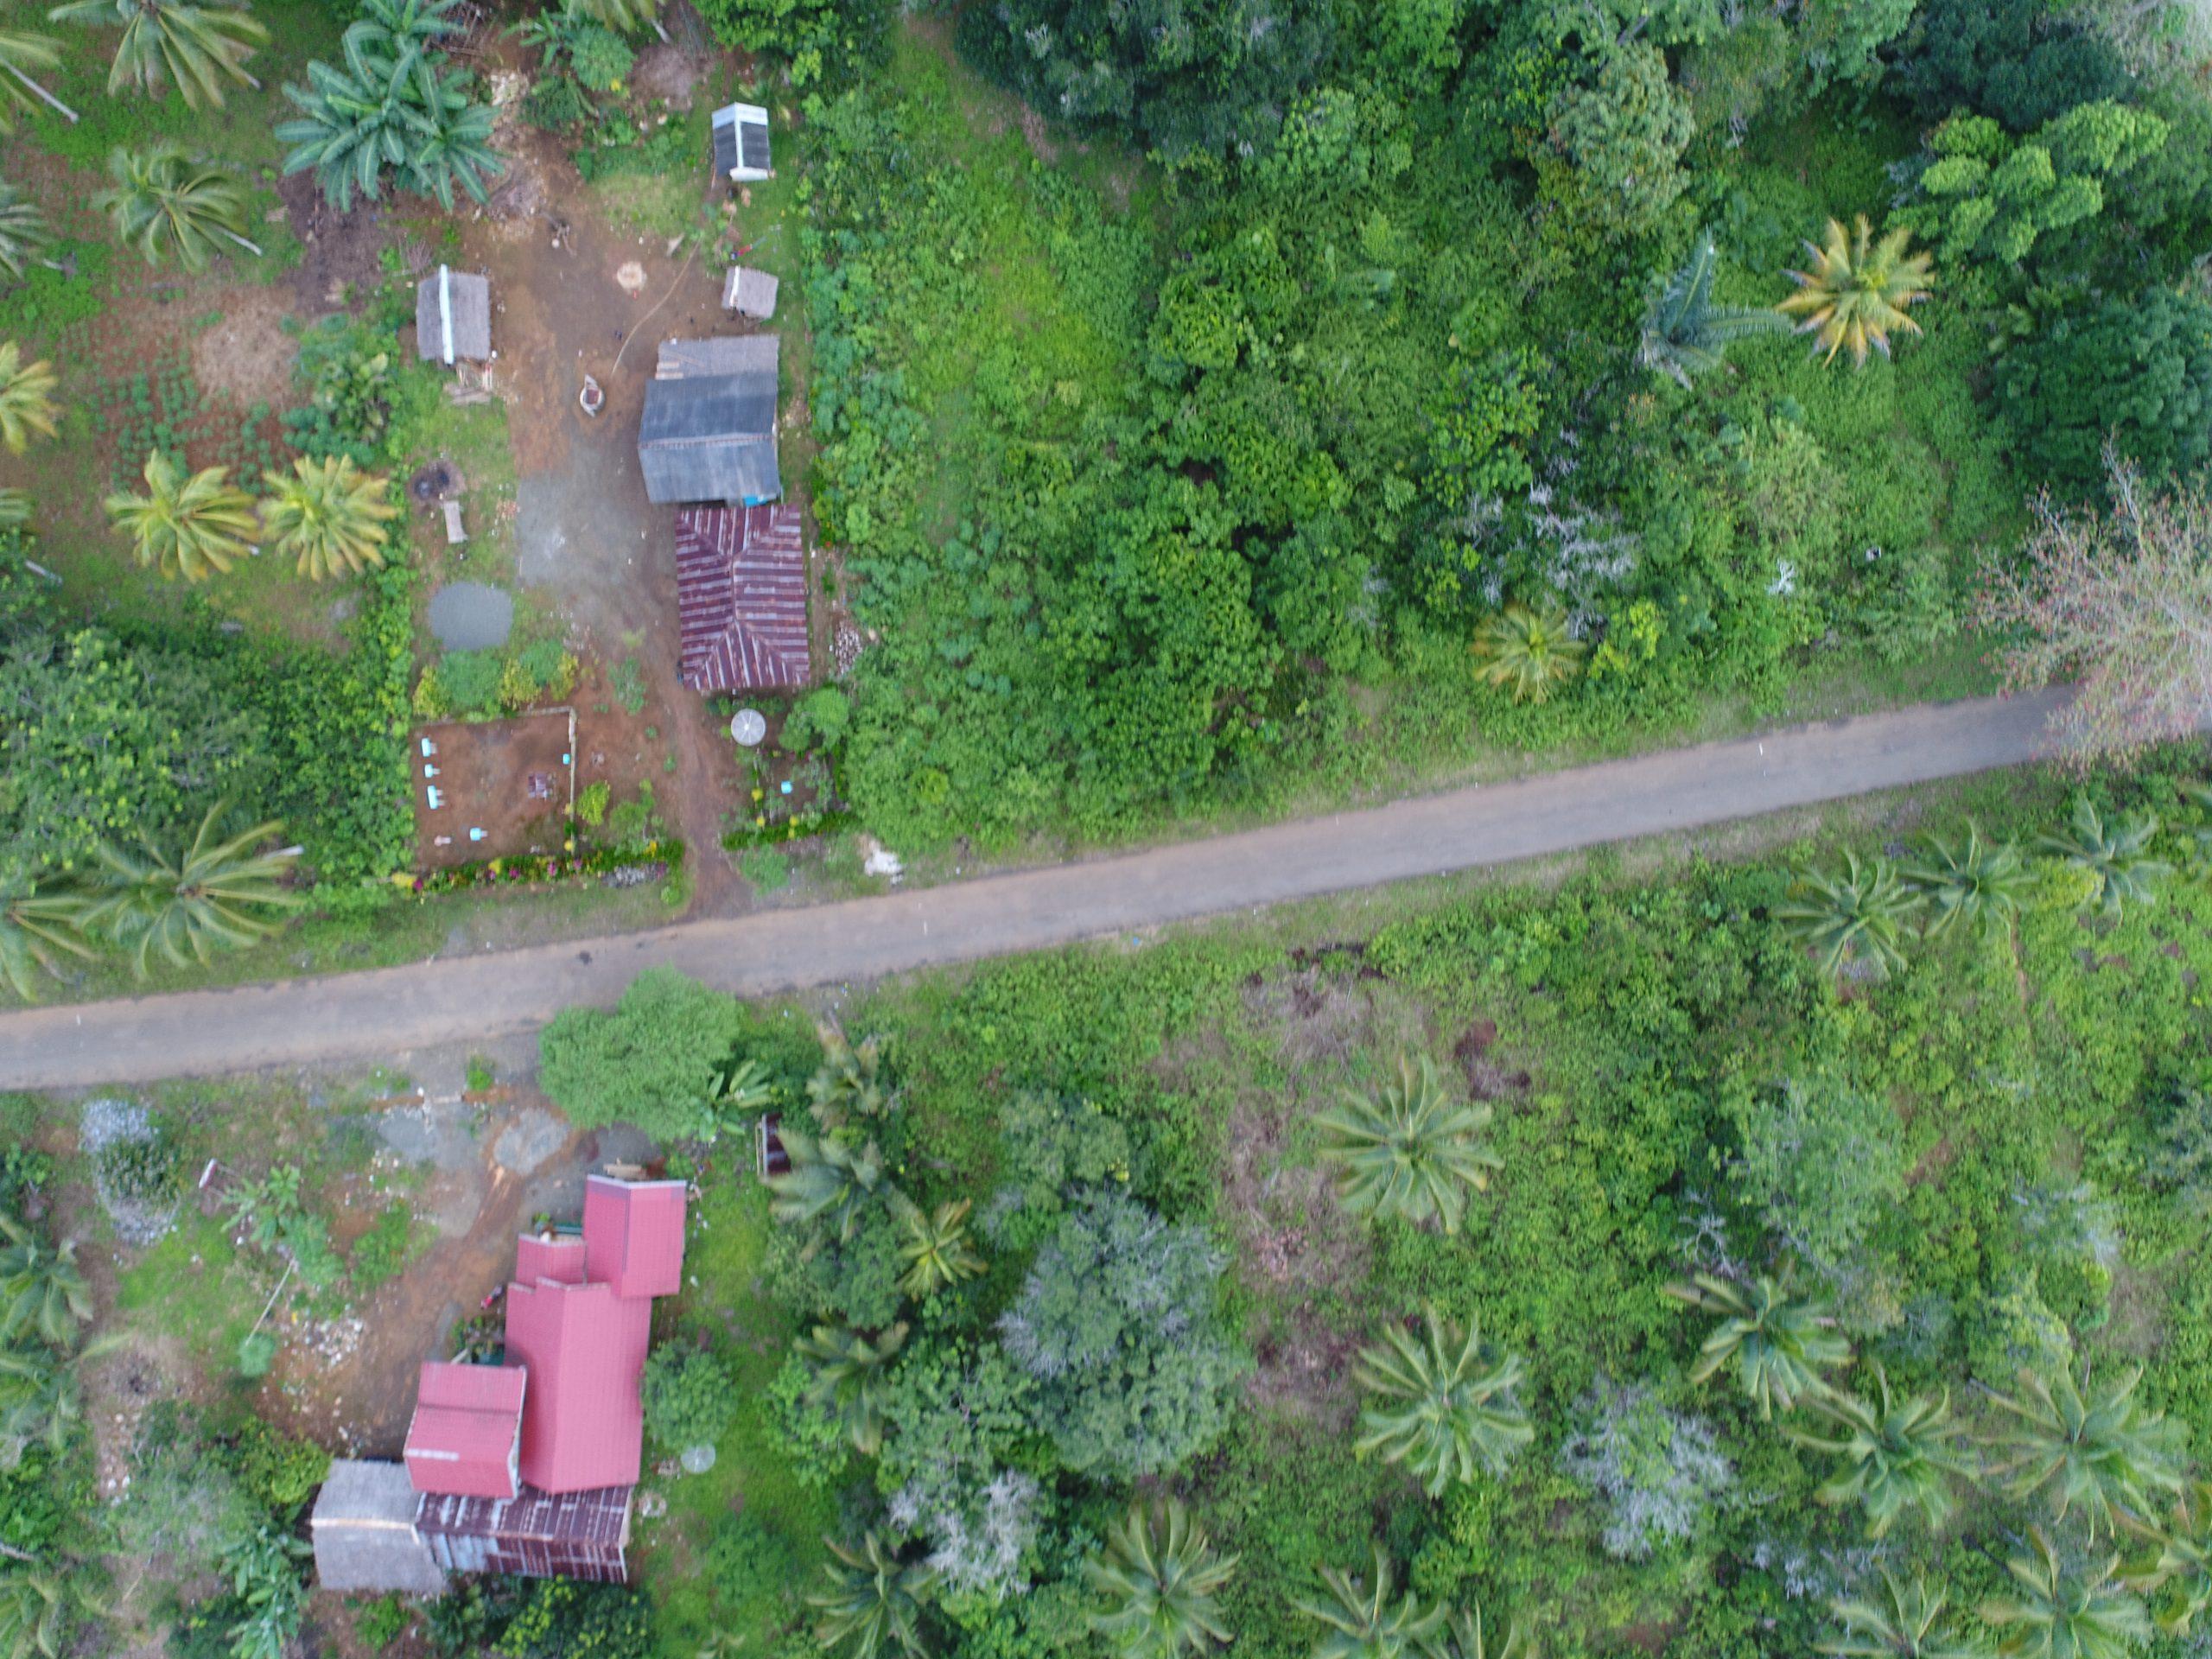 Pemetaan Udara menggunakan Drone Area Luwuk, Lamongan dan Jawa Barat